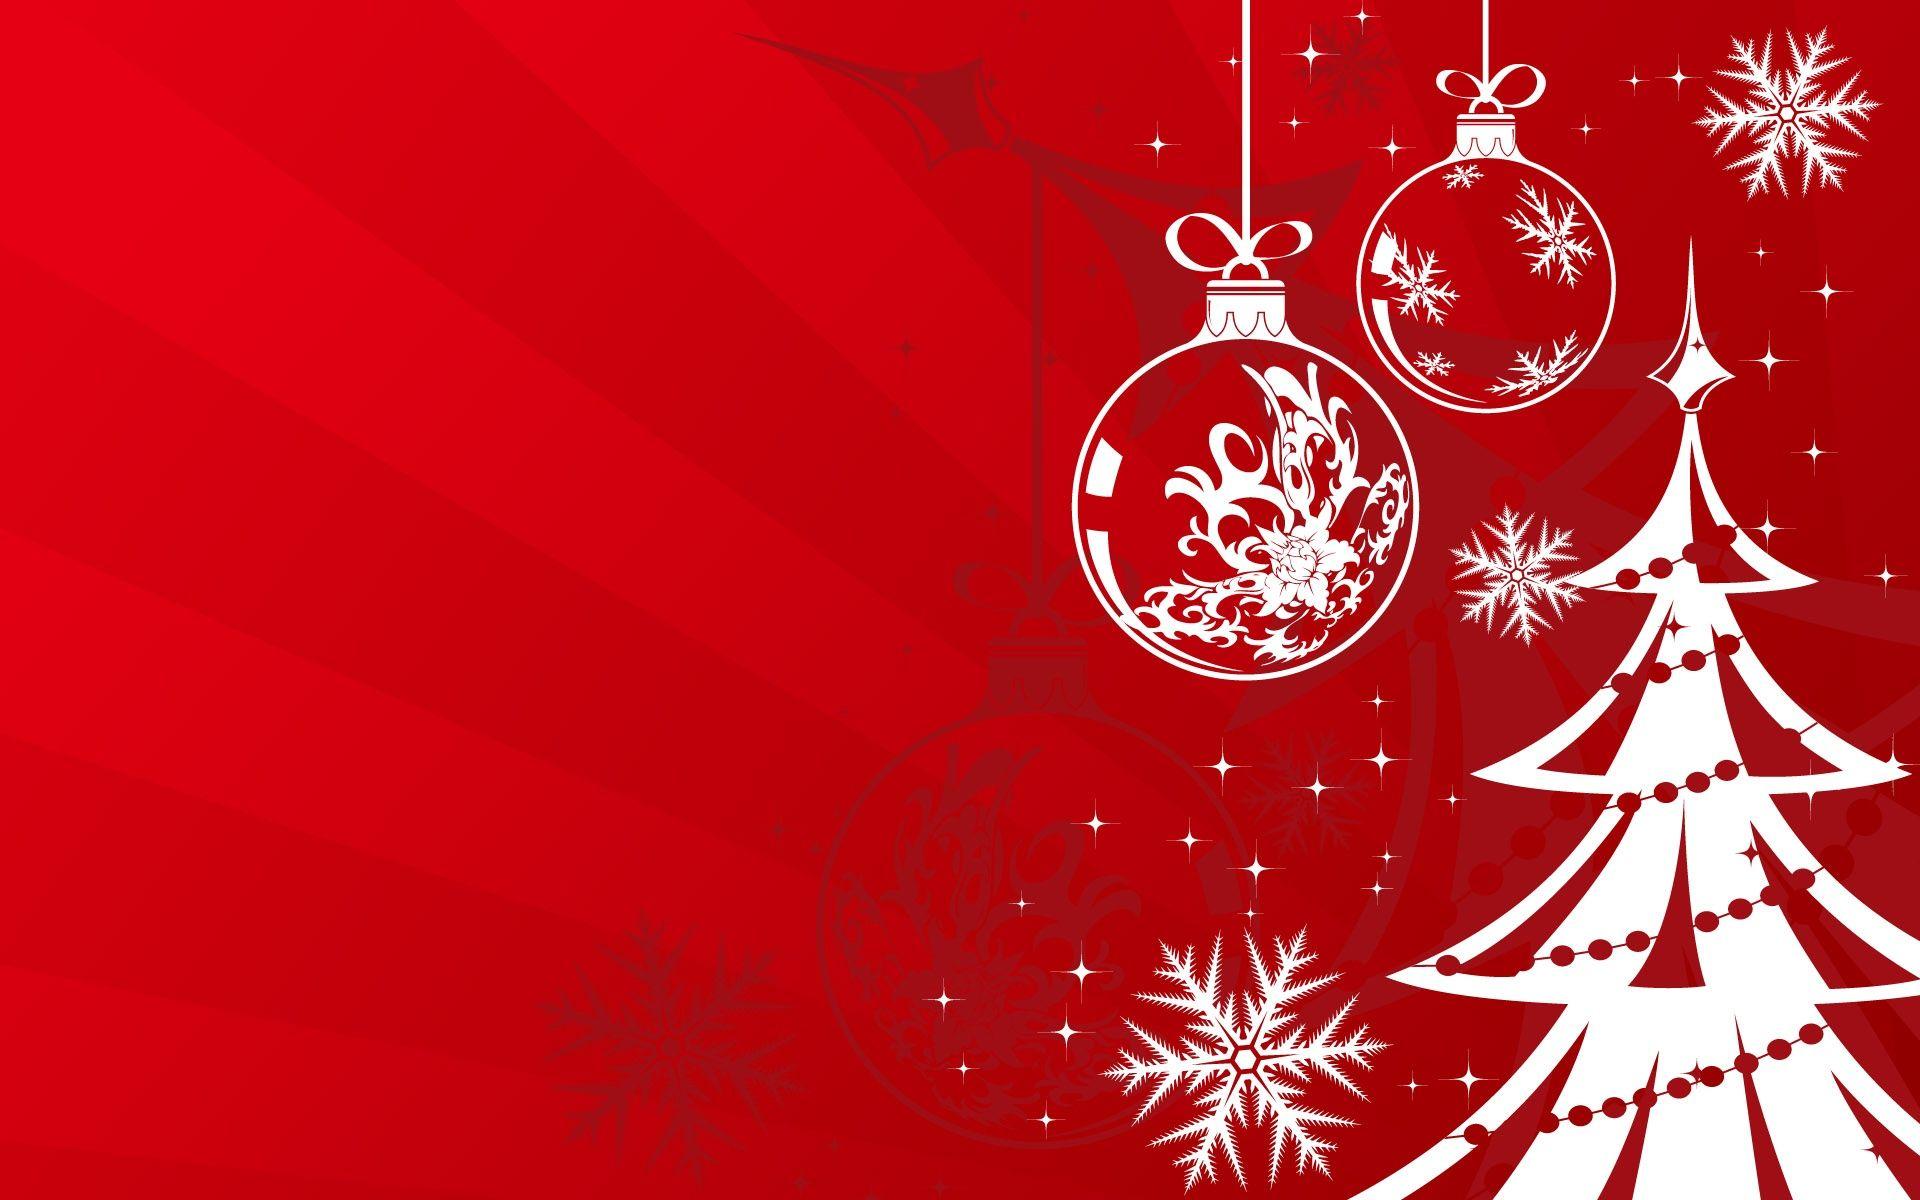 Testo pastorella natalizia